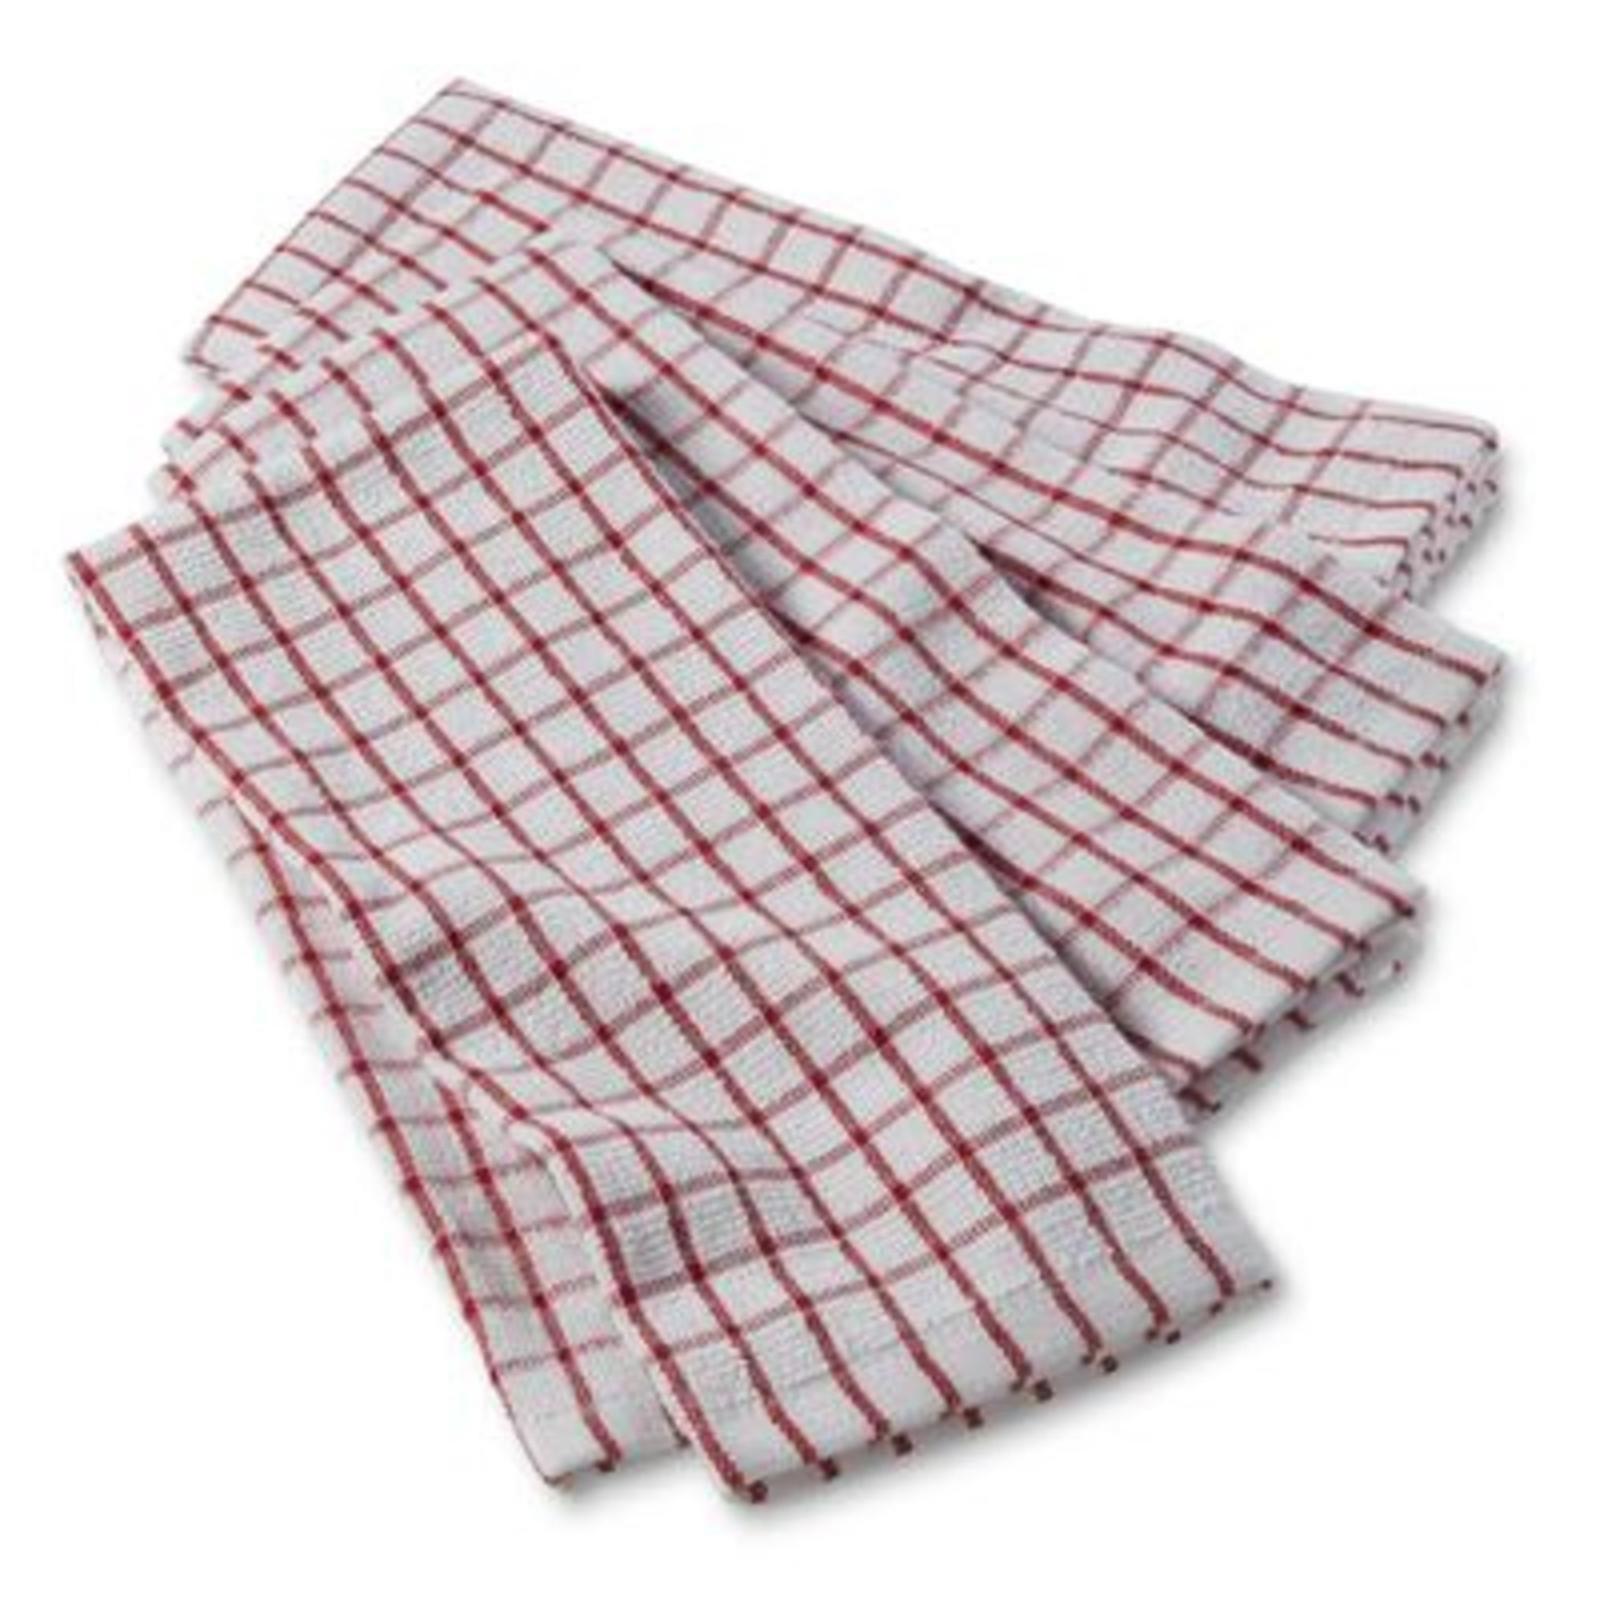 kitchen towels - kmart